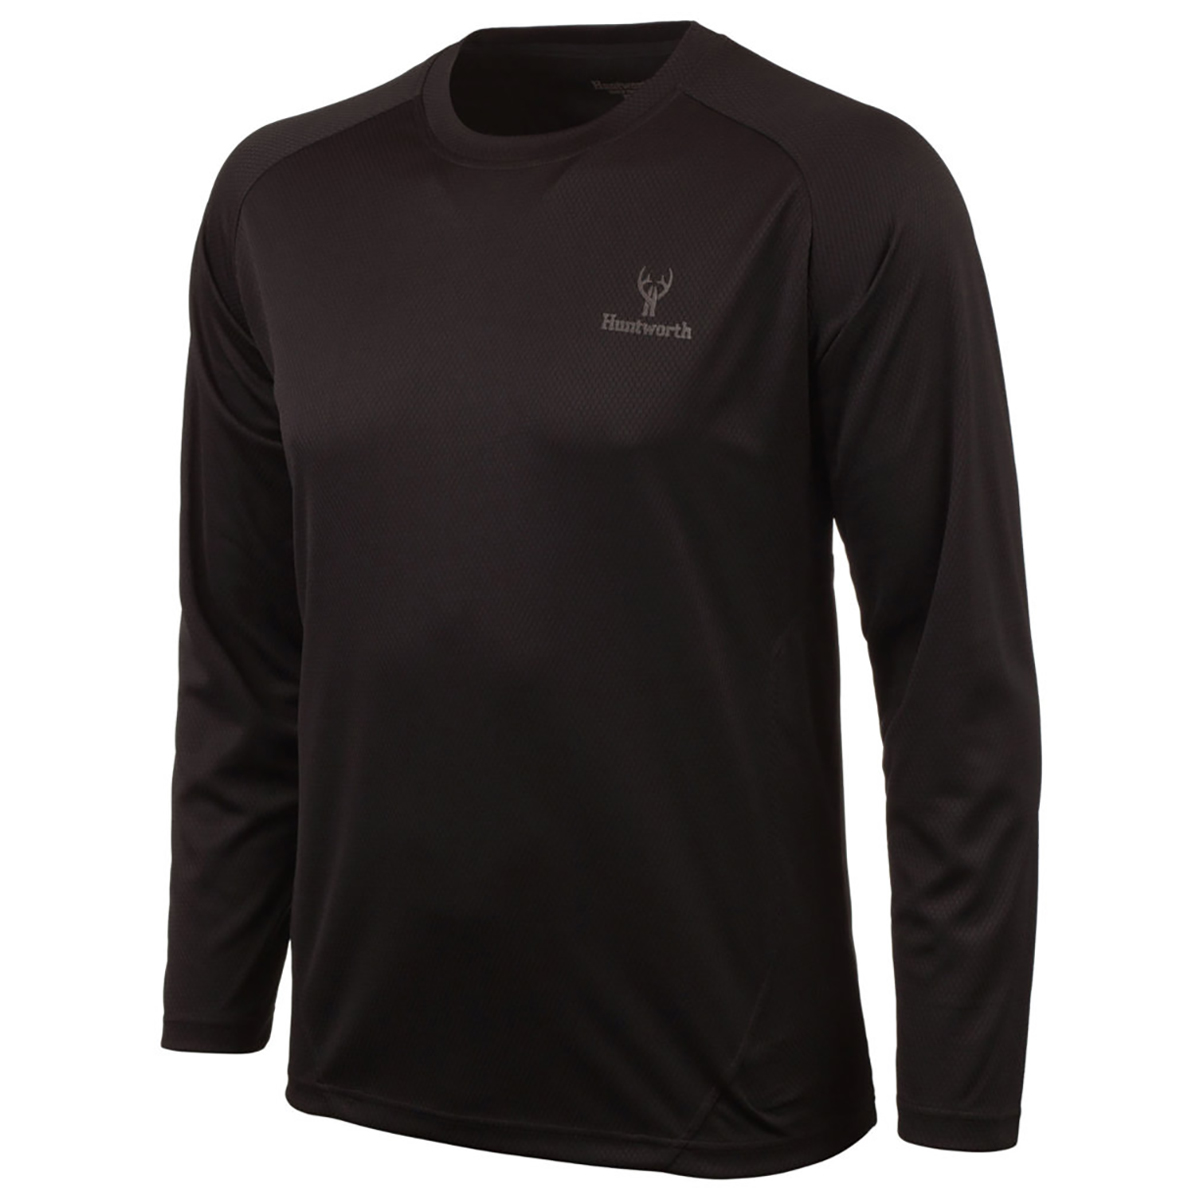 Huntworth Men's Bird's Eye Mesh Long-Sleeve Shirt, Black